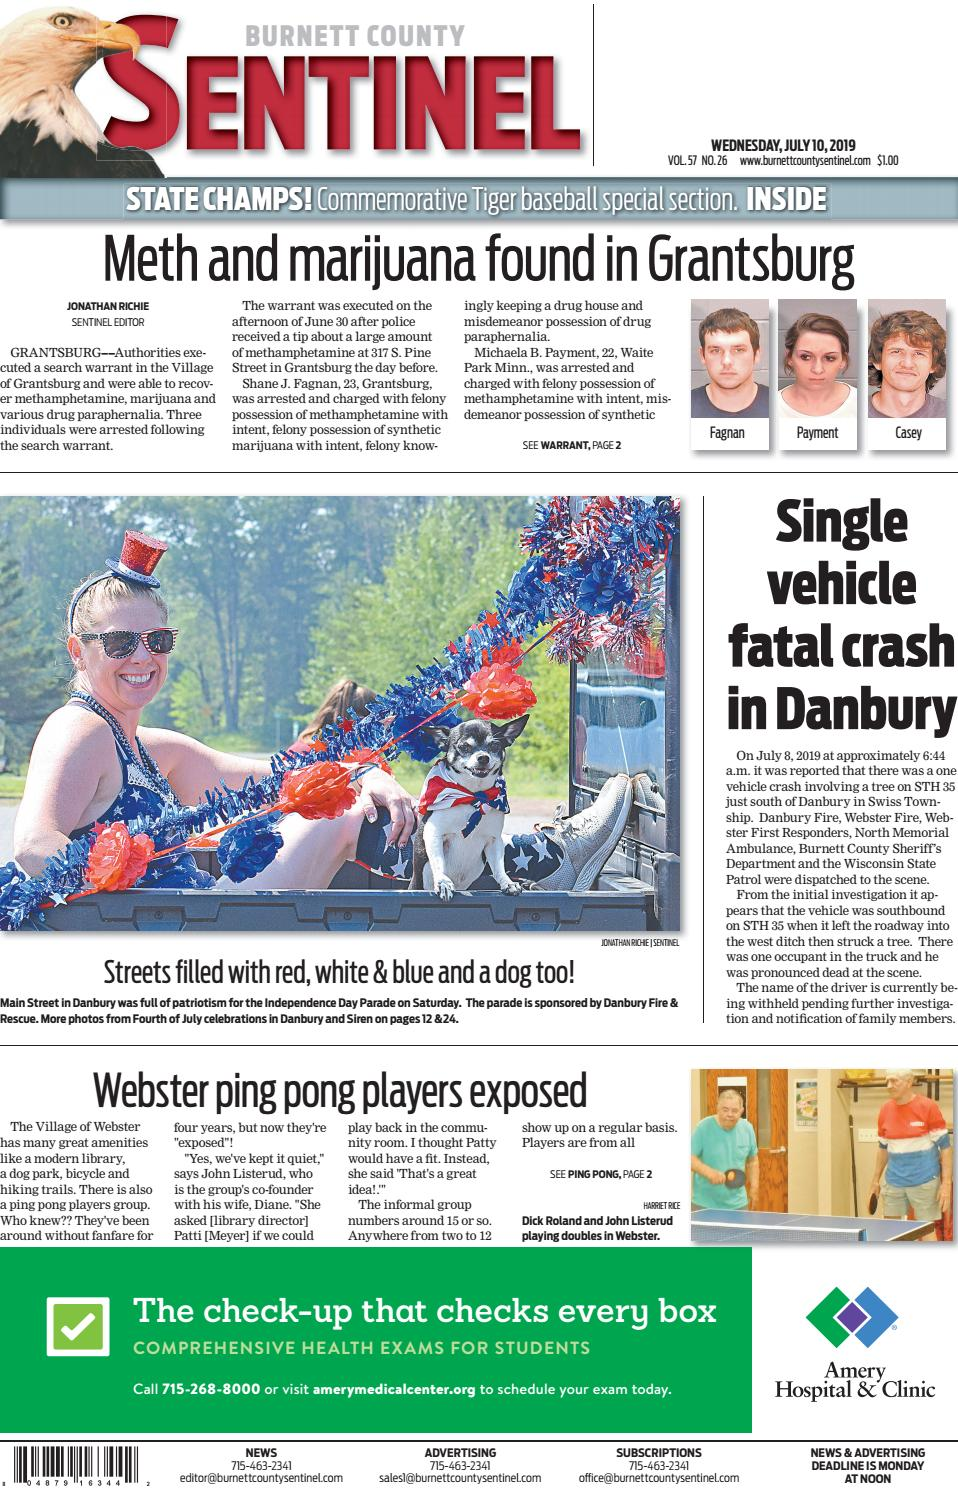 The Burnett County Sentinel 07 10 2019 By Burnett County Sentinel